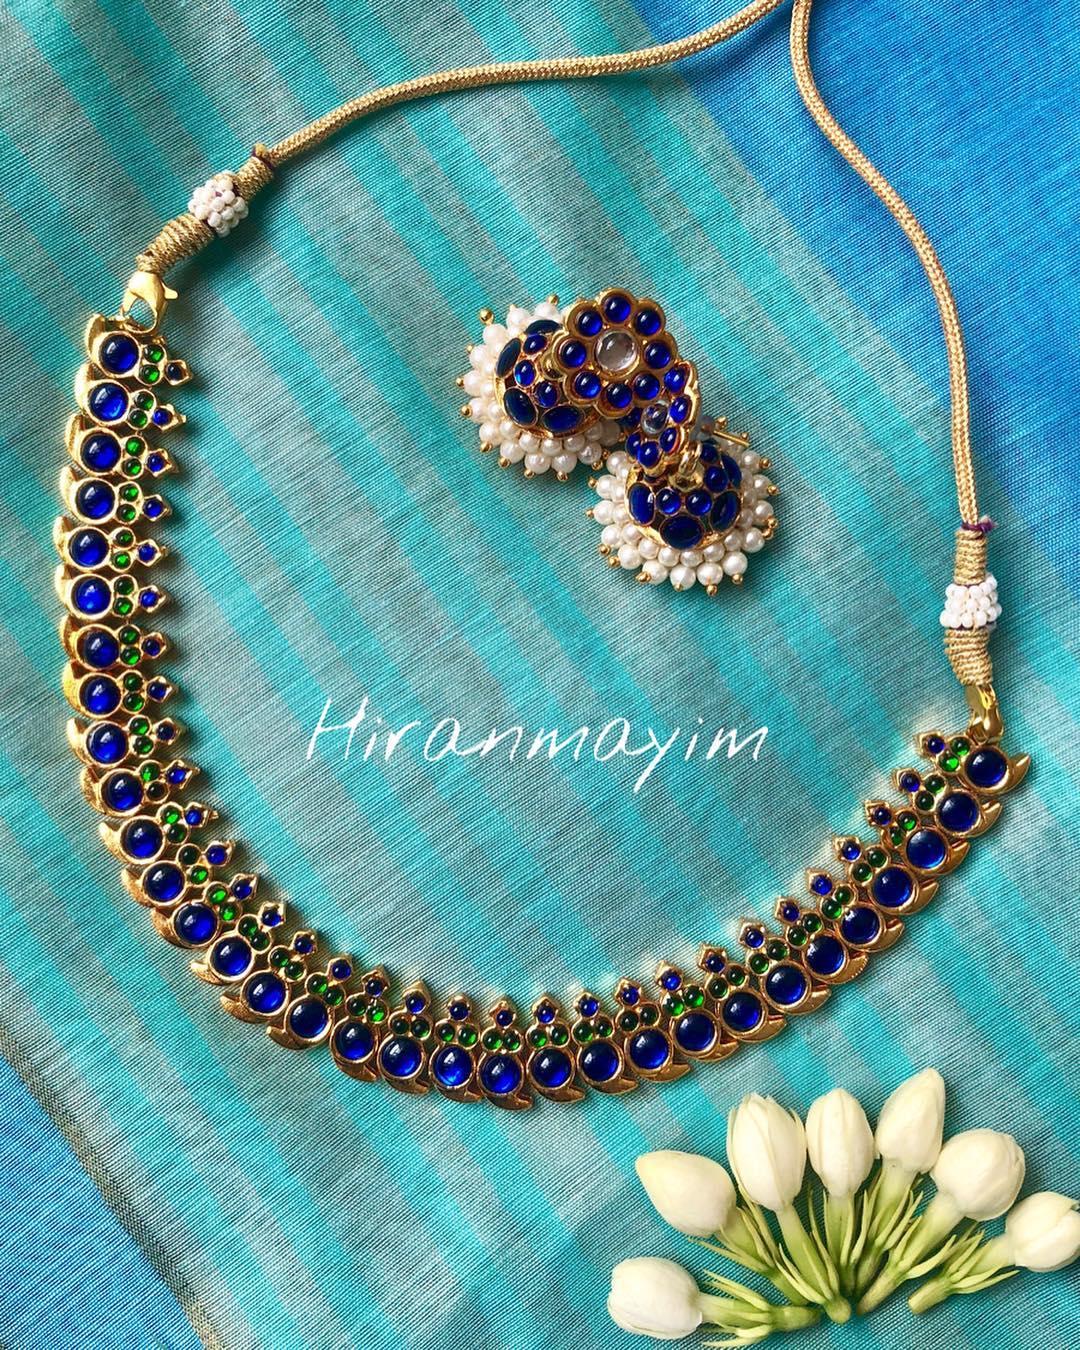 kemp-jewellery-designs-shop-online (2)